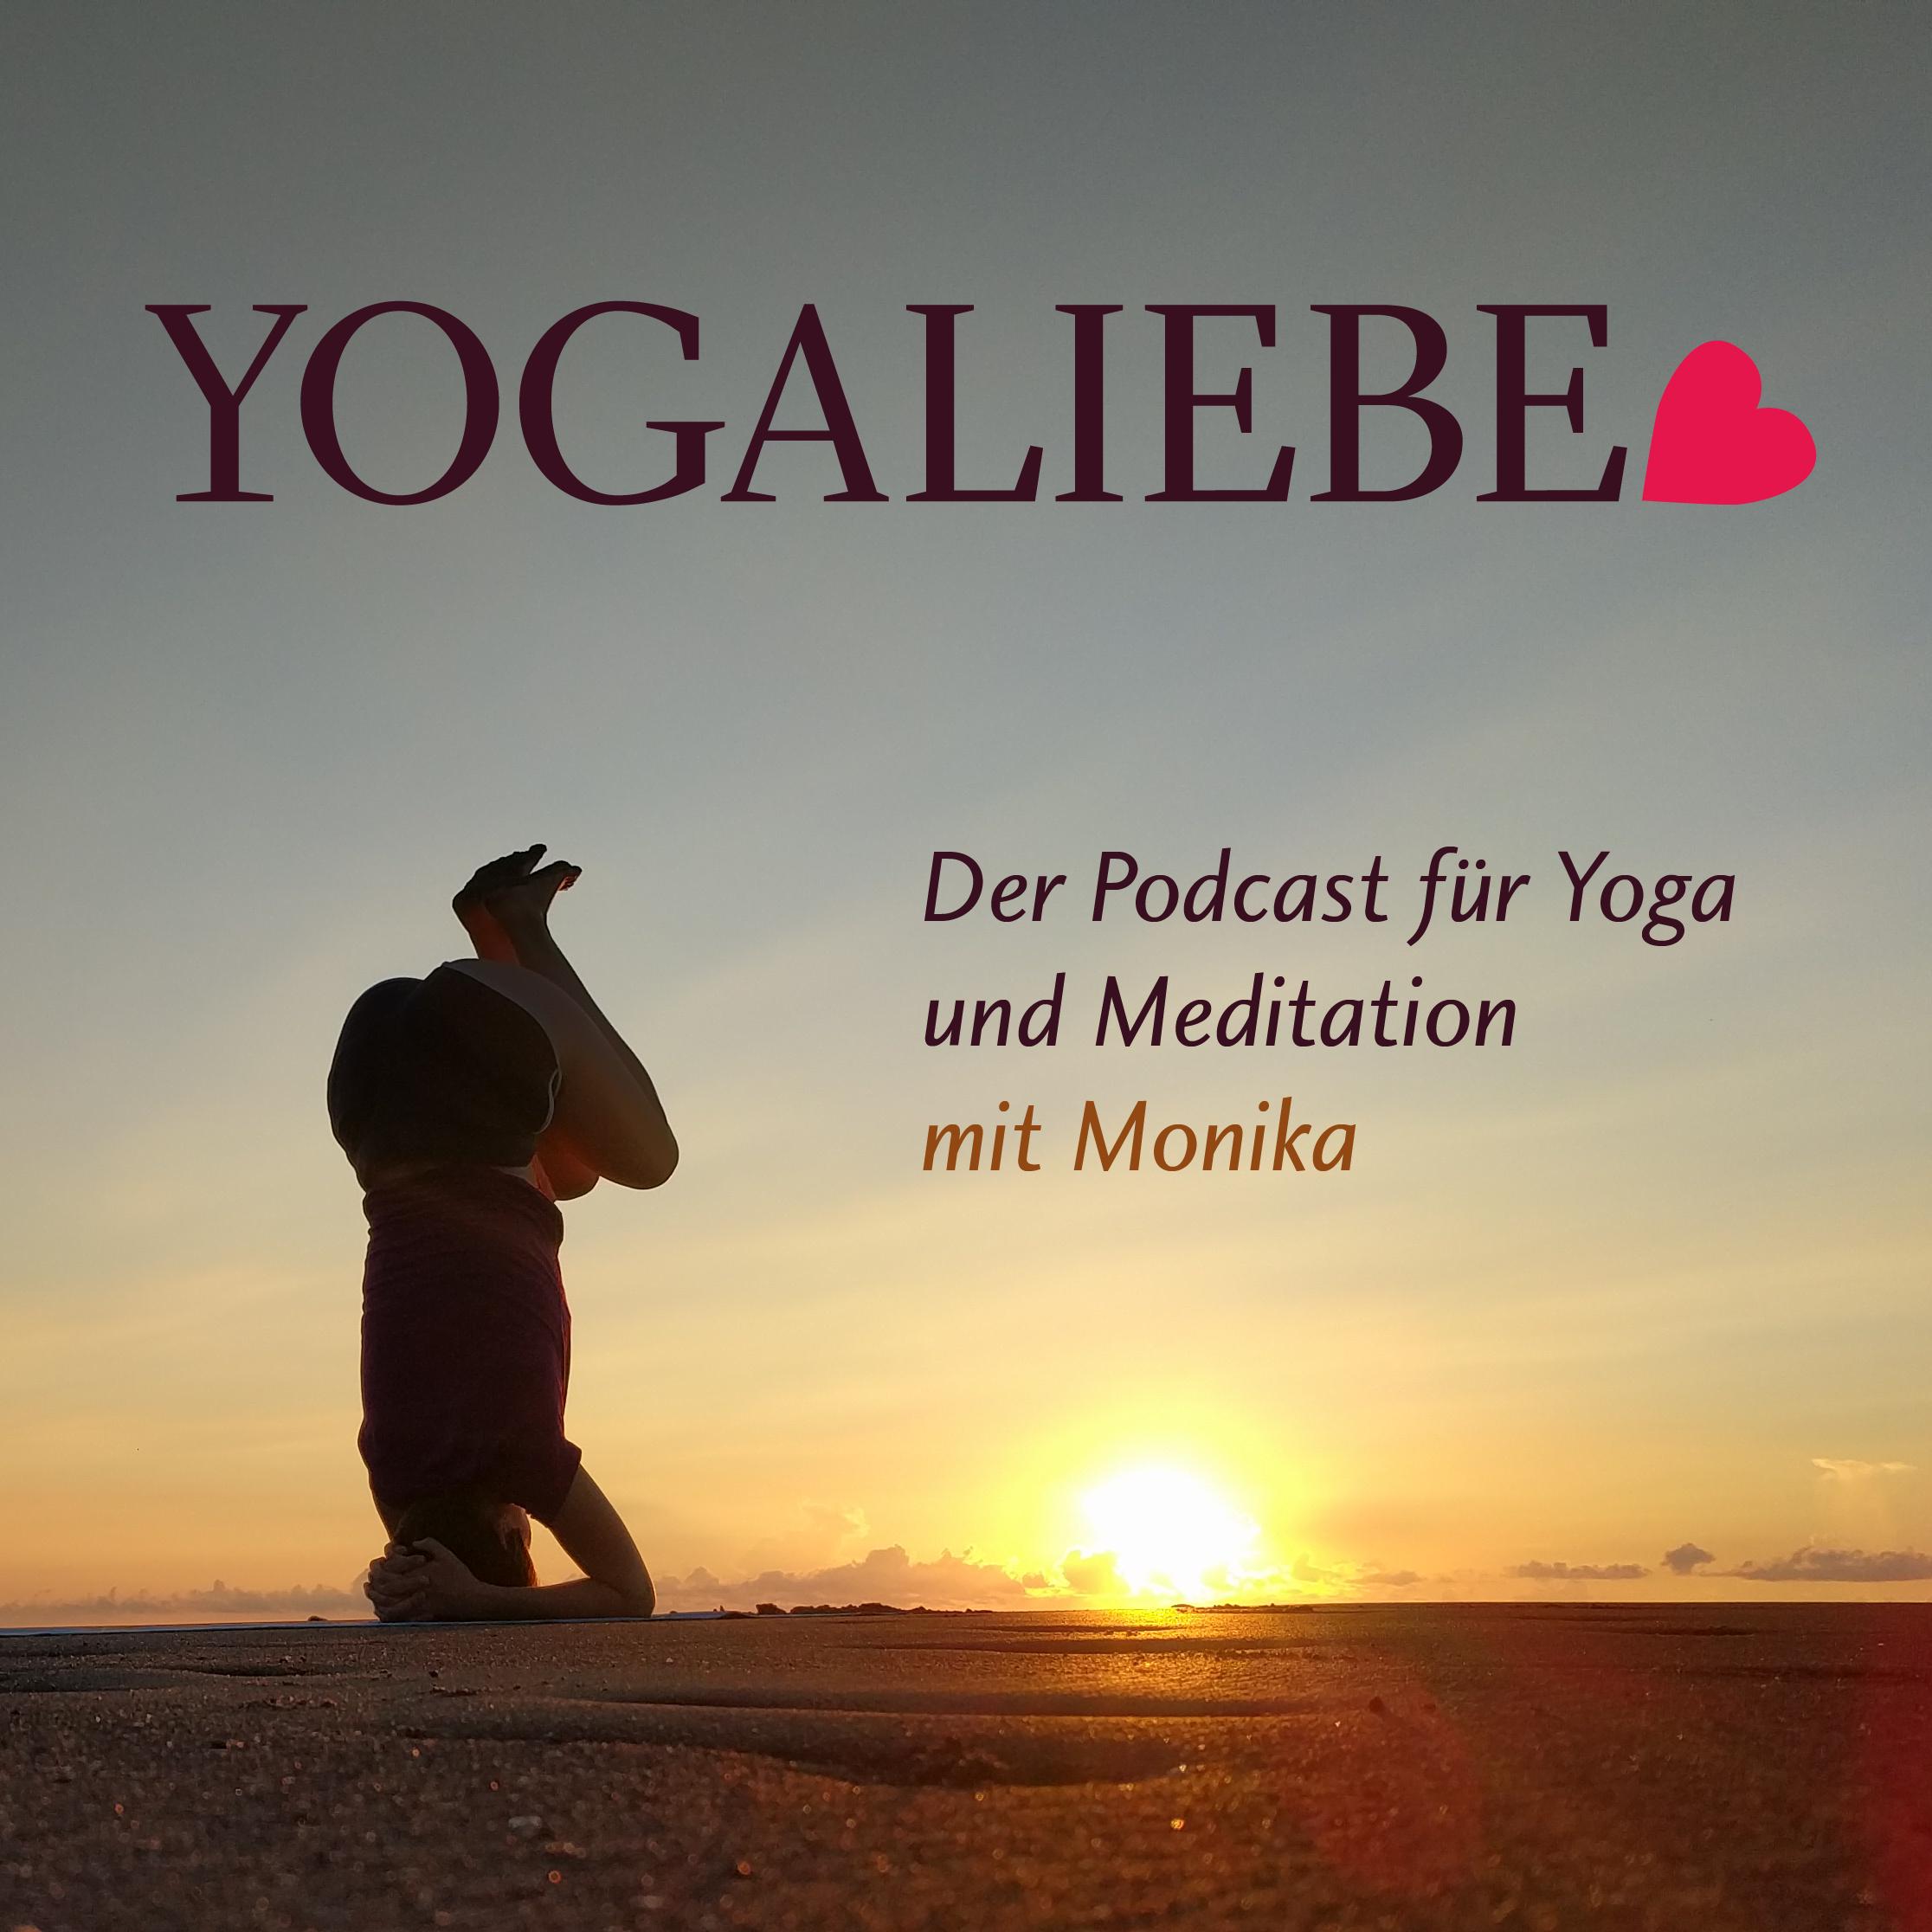 Yogaliebe: Yoga & Meditation Podcast show art